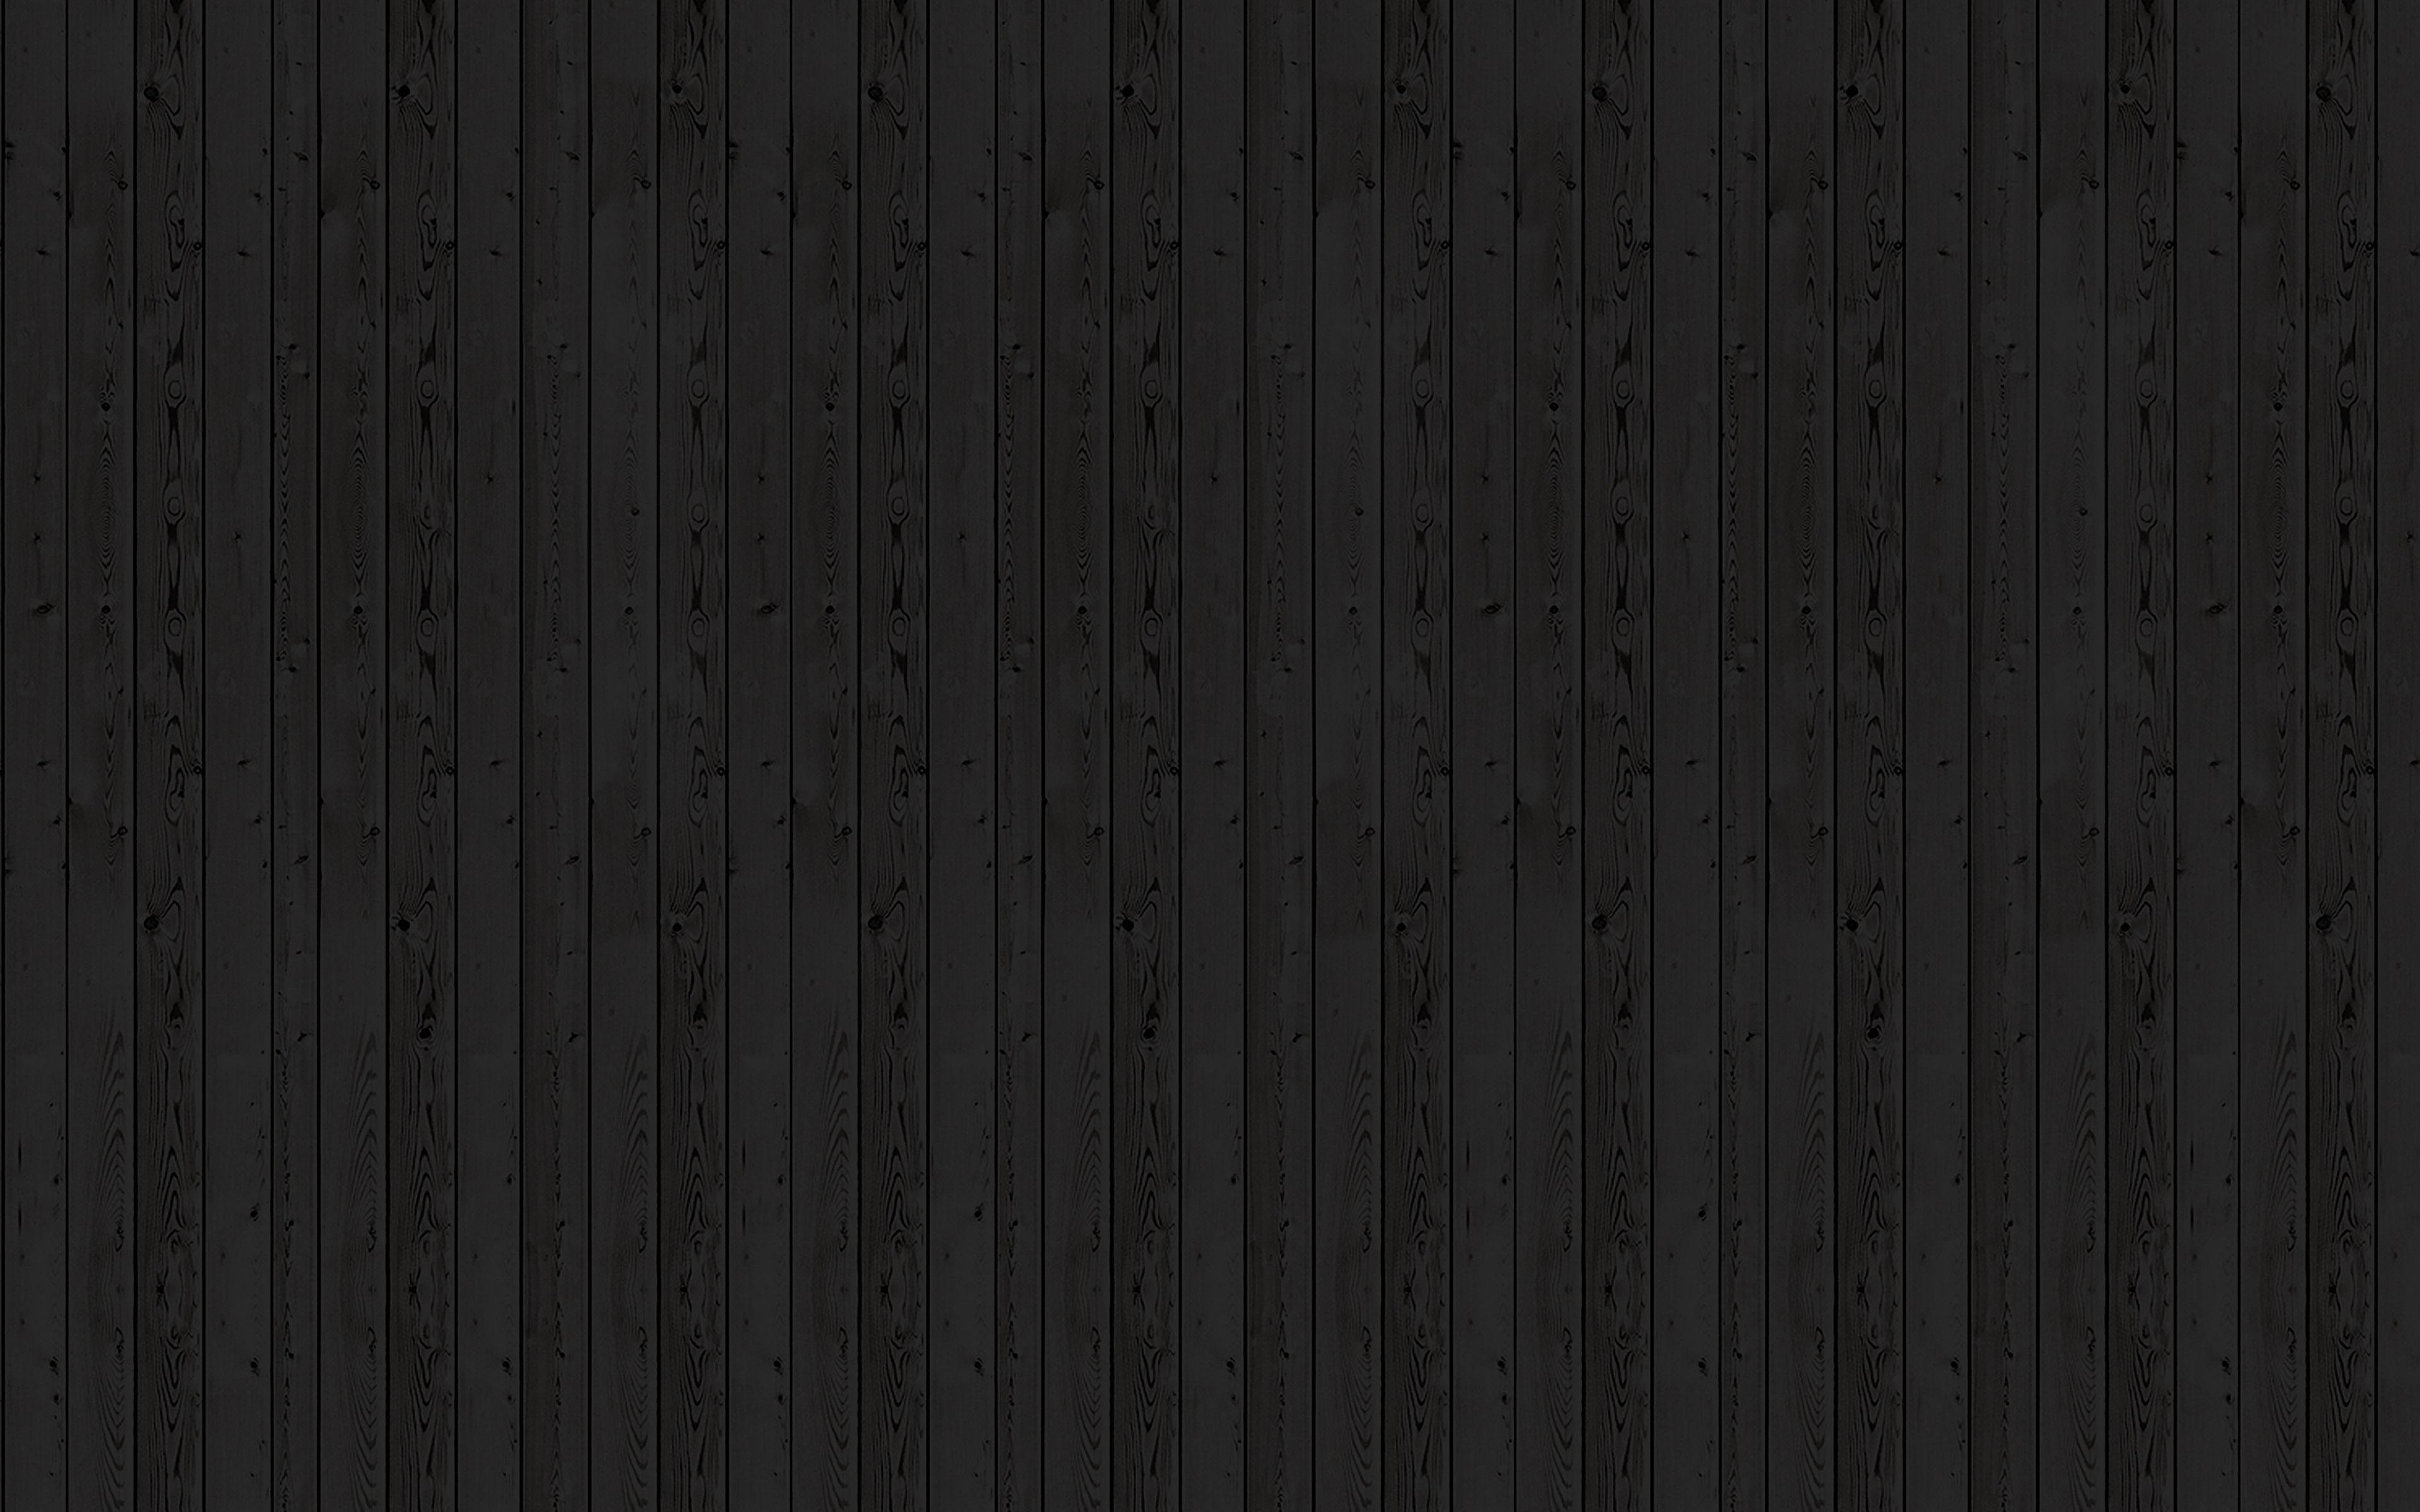 dark hardwood floor pattern. 3840 X 2400 Dark Hardwood Floor Pattern R